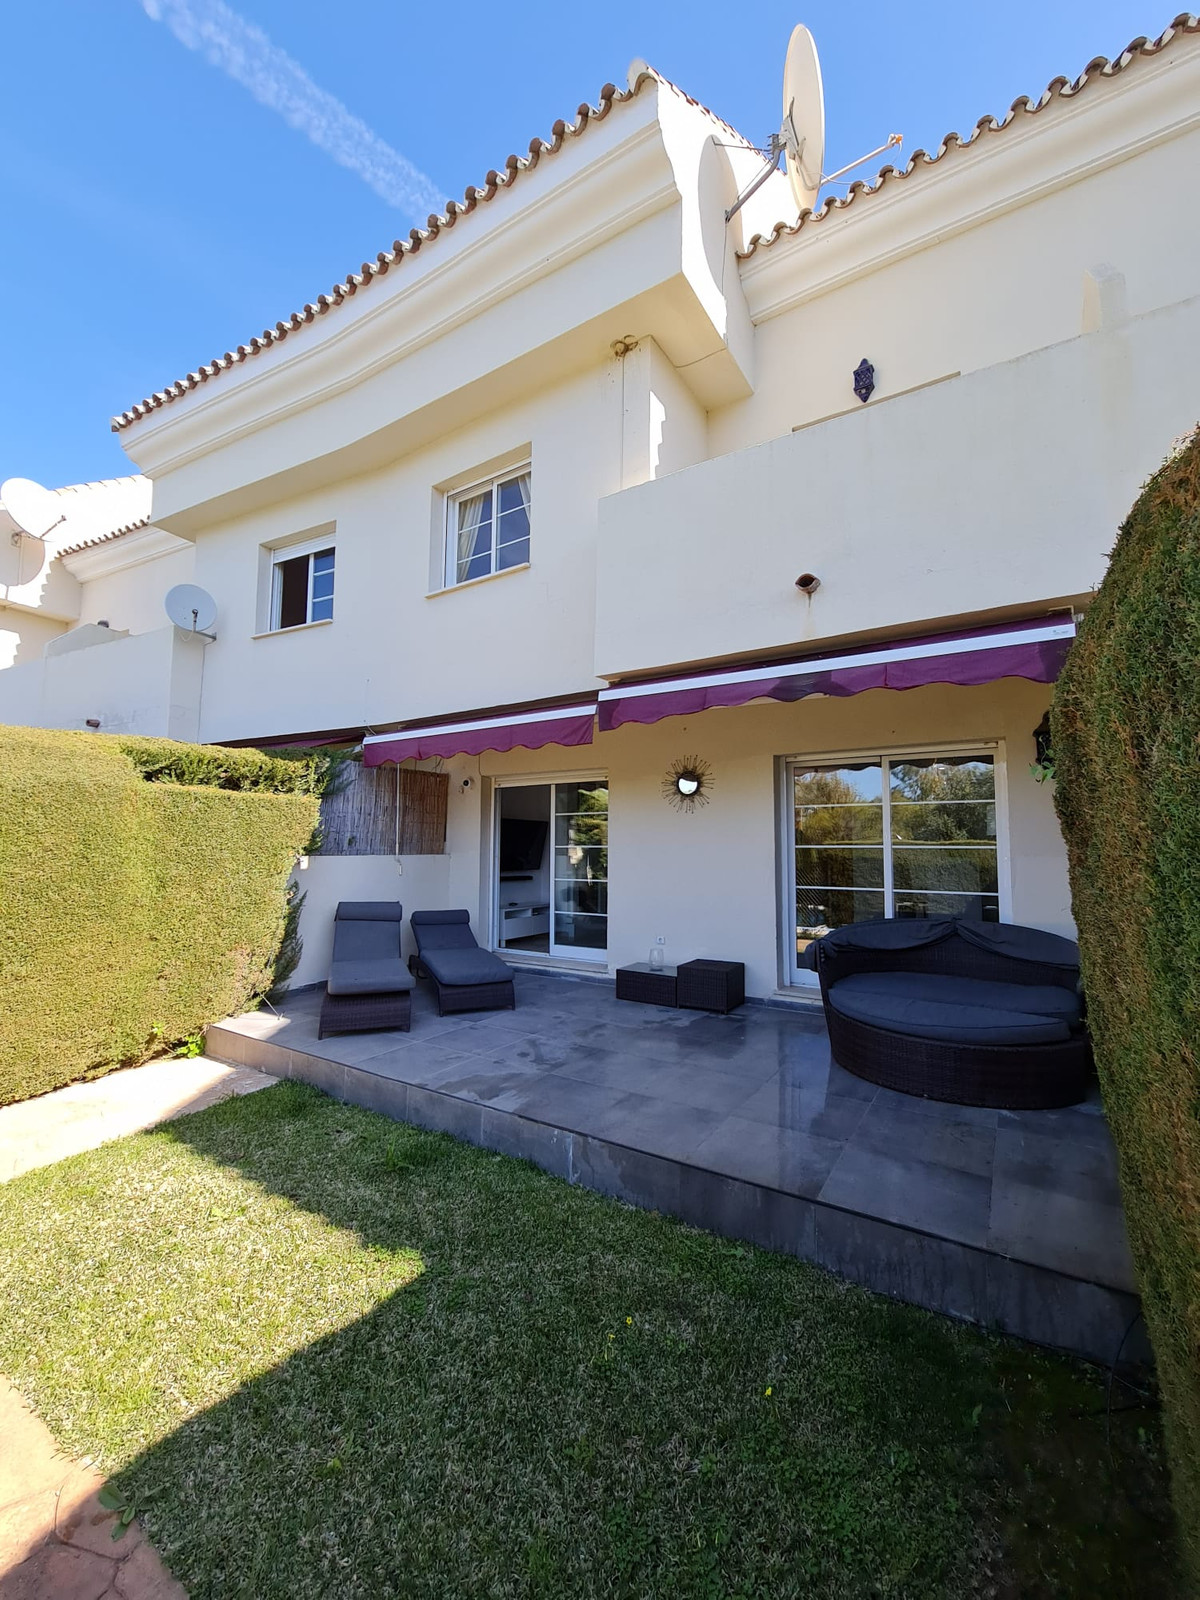 Maison Jumelée  Mitoyenne en location  à Marbella